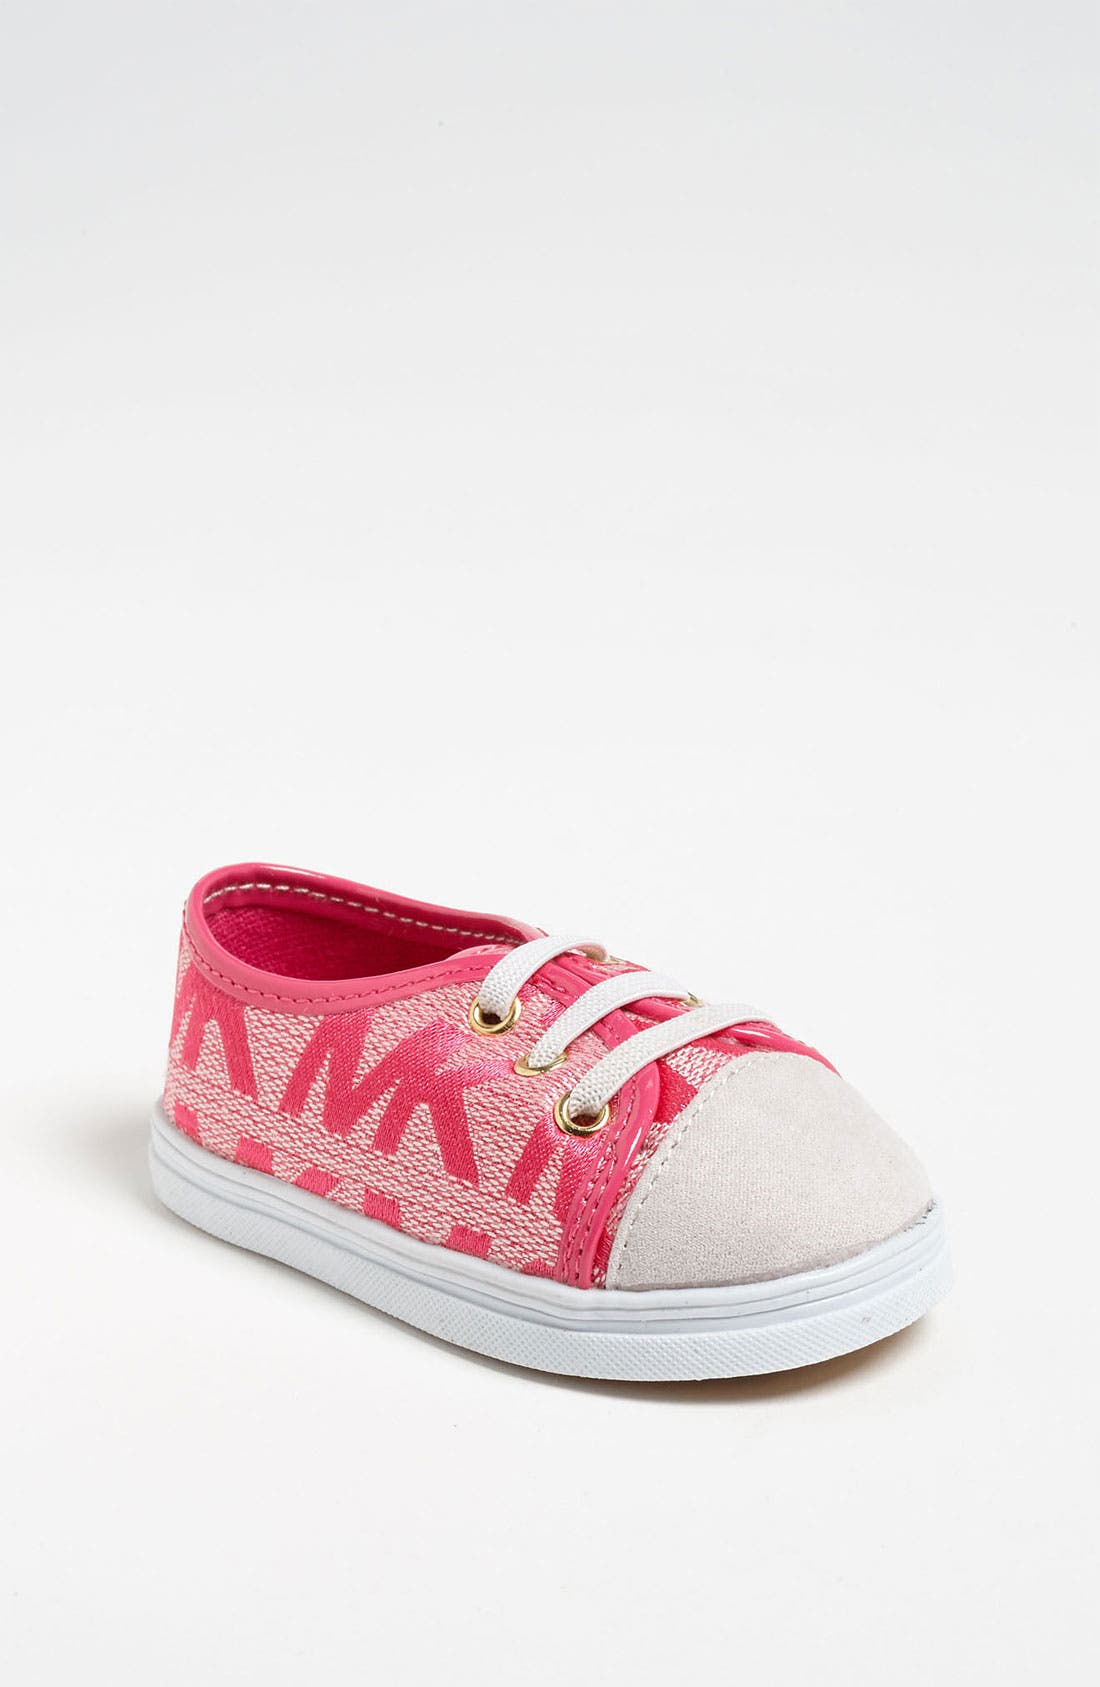 Alternate Image 1 Selected - MICHAEL Michael Kors 'Baby Monogram' Crib Shoe (Baby)